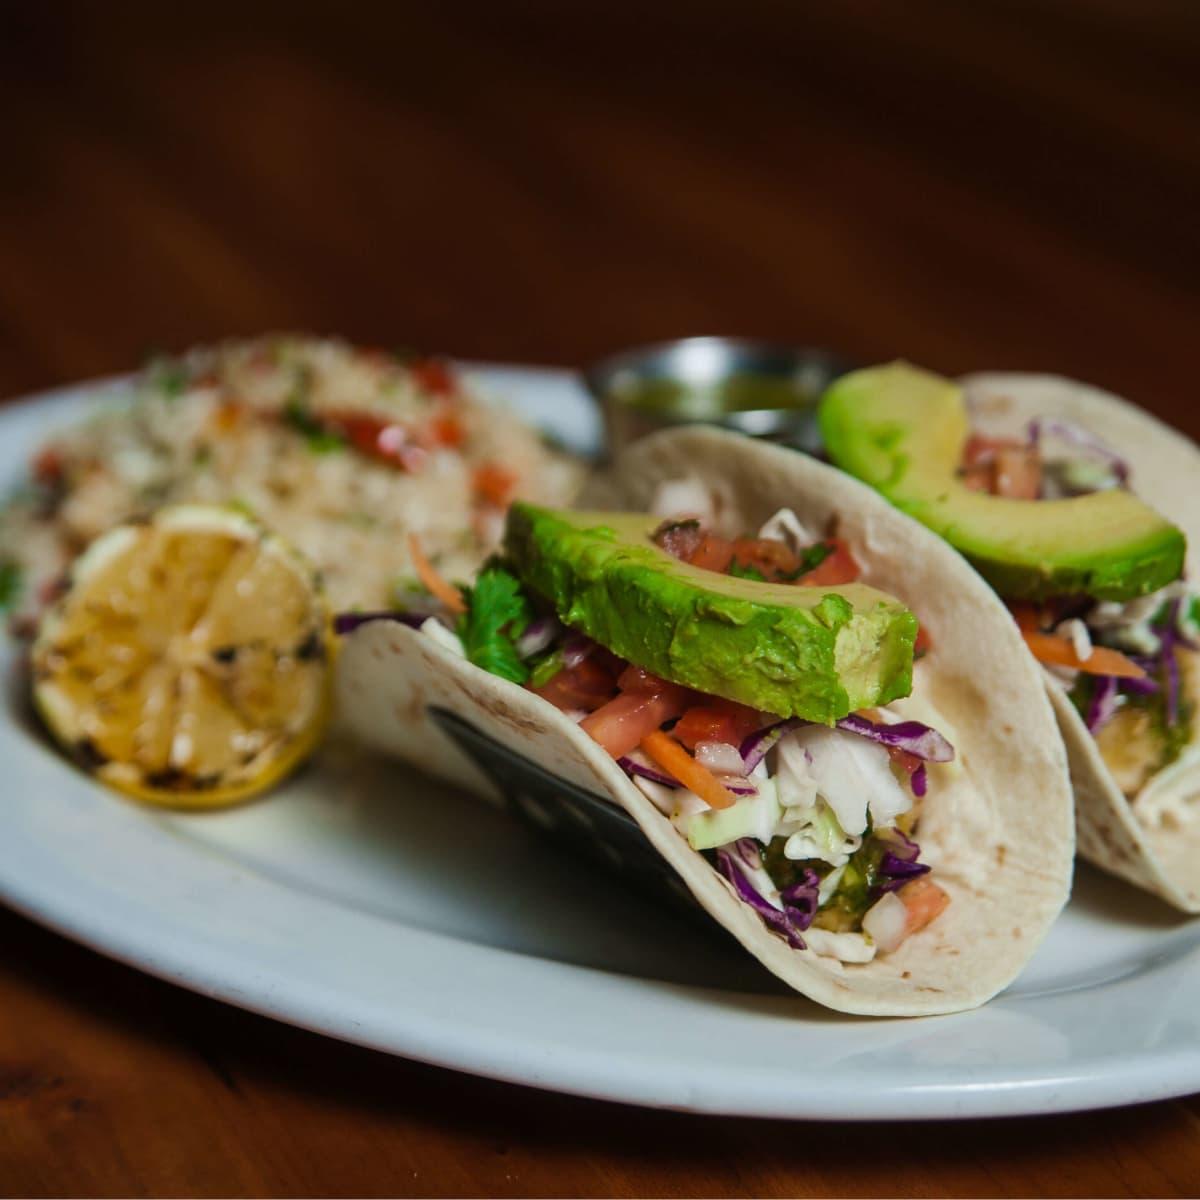 Mahi mahi tacos at Cover 3